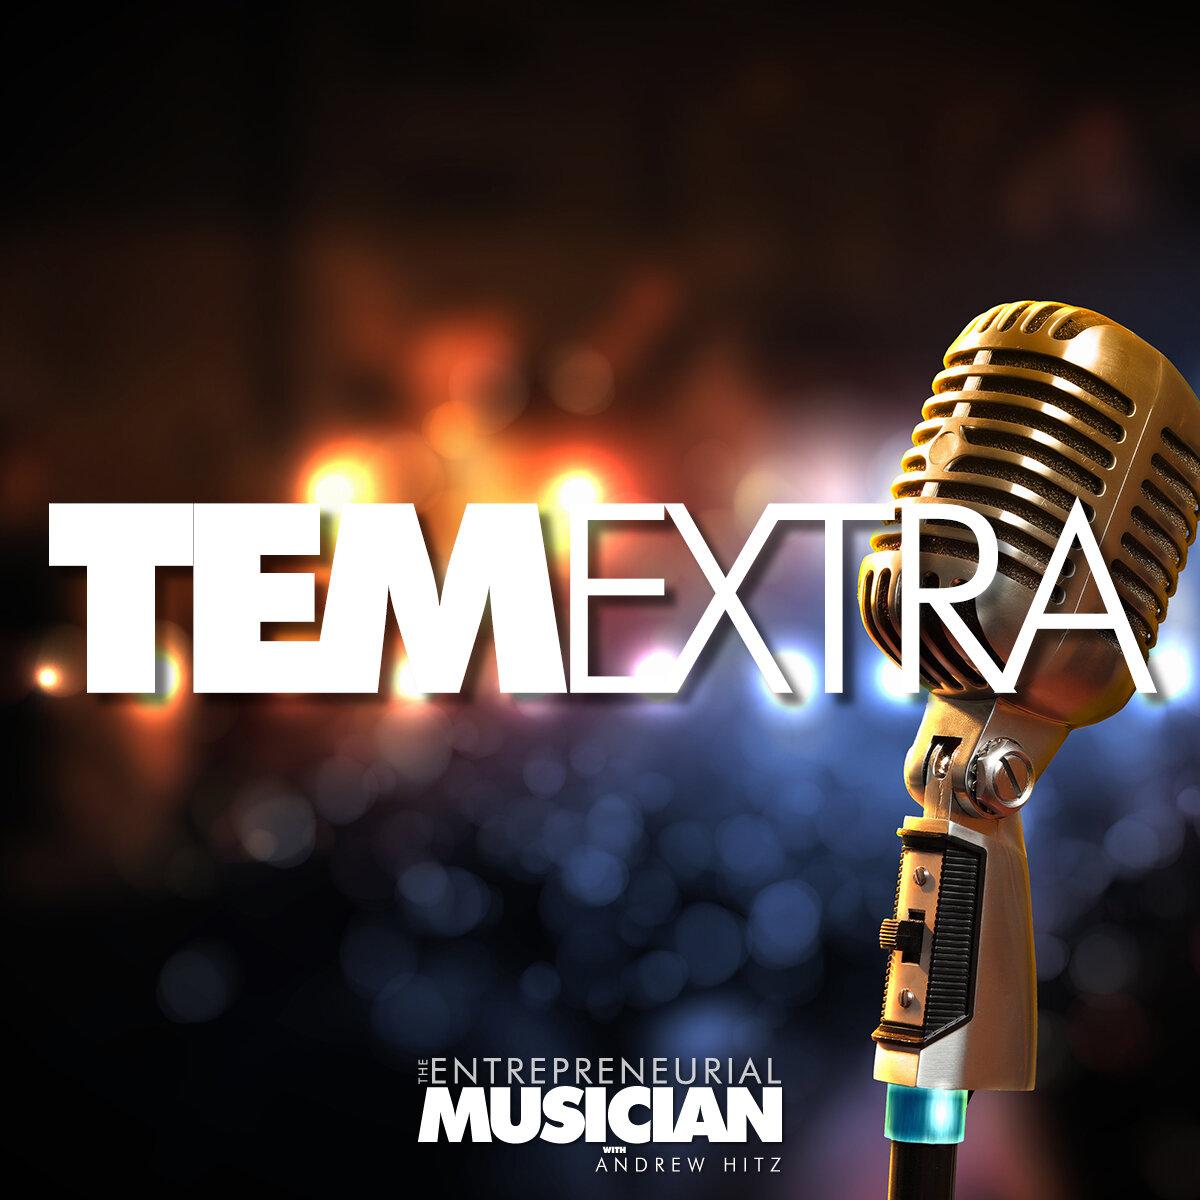 TEMextra-Promo.jpg